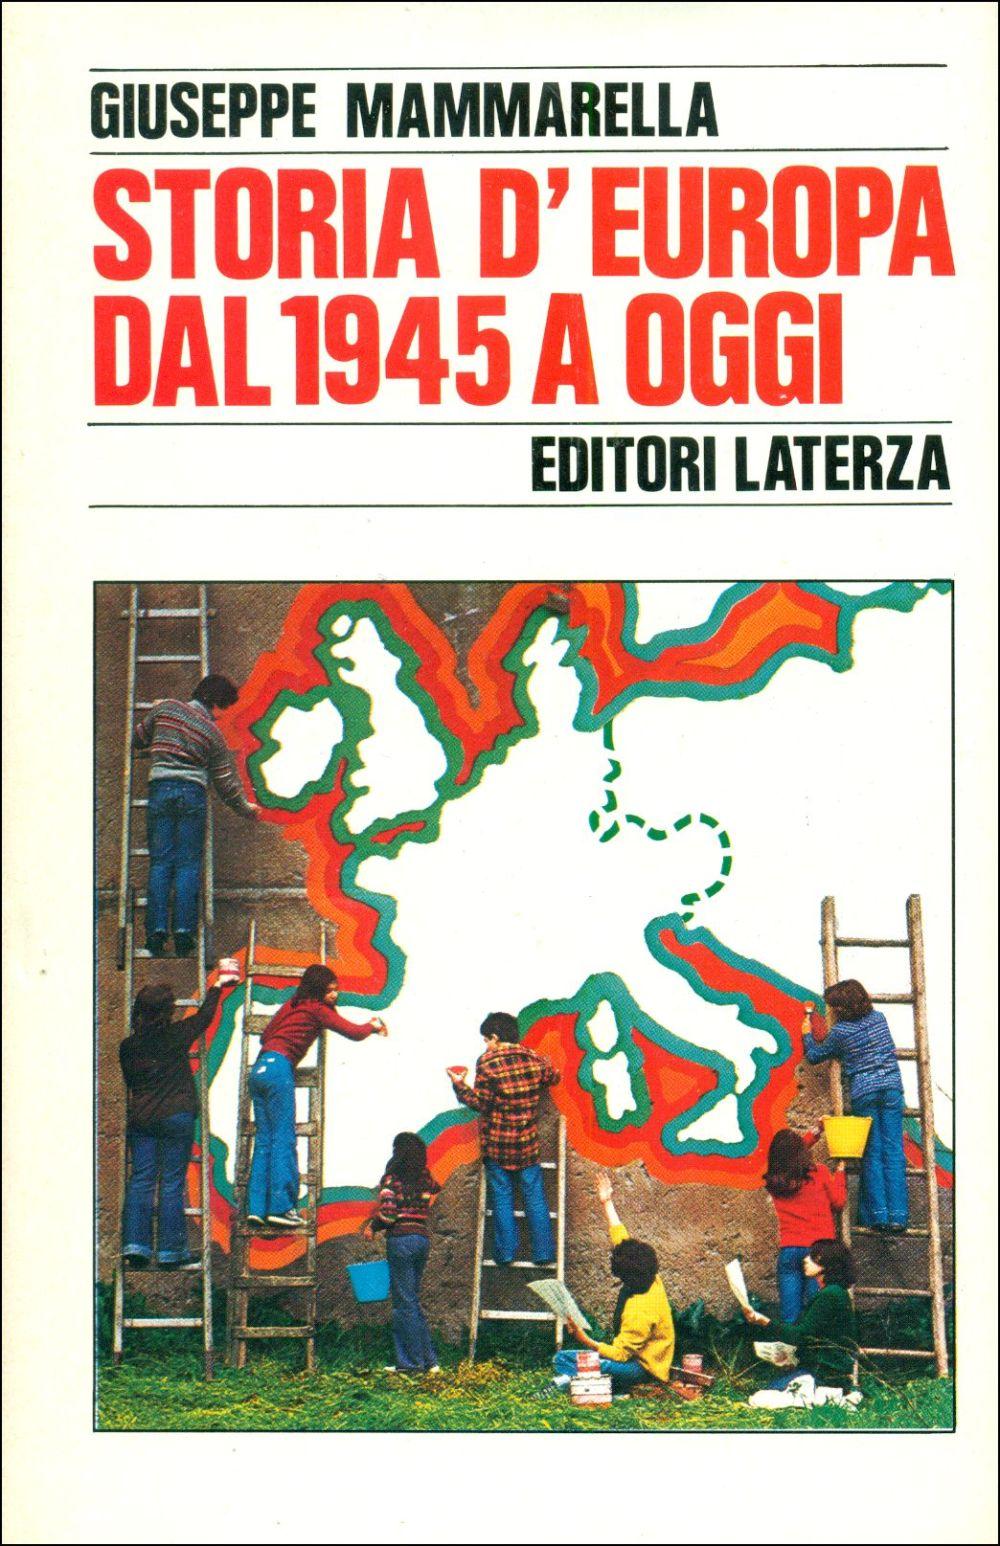 medium resolution of storia d europa dal 1945 a oggi di mammarella giuseppe abebooks